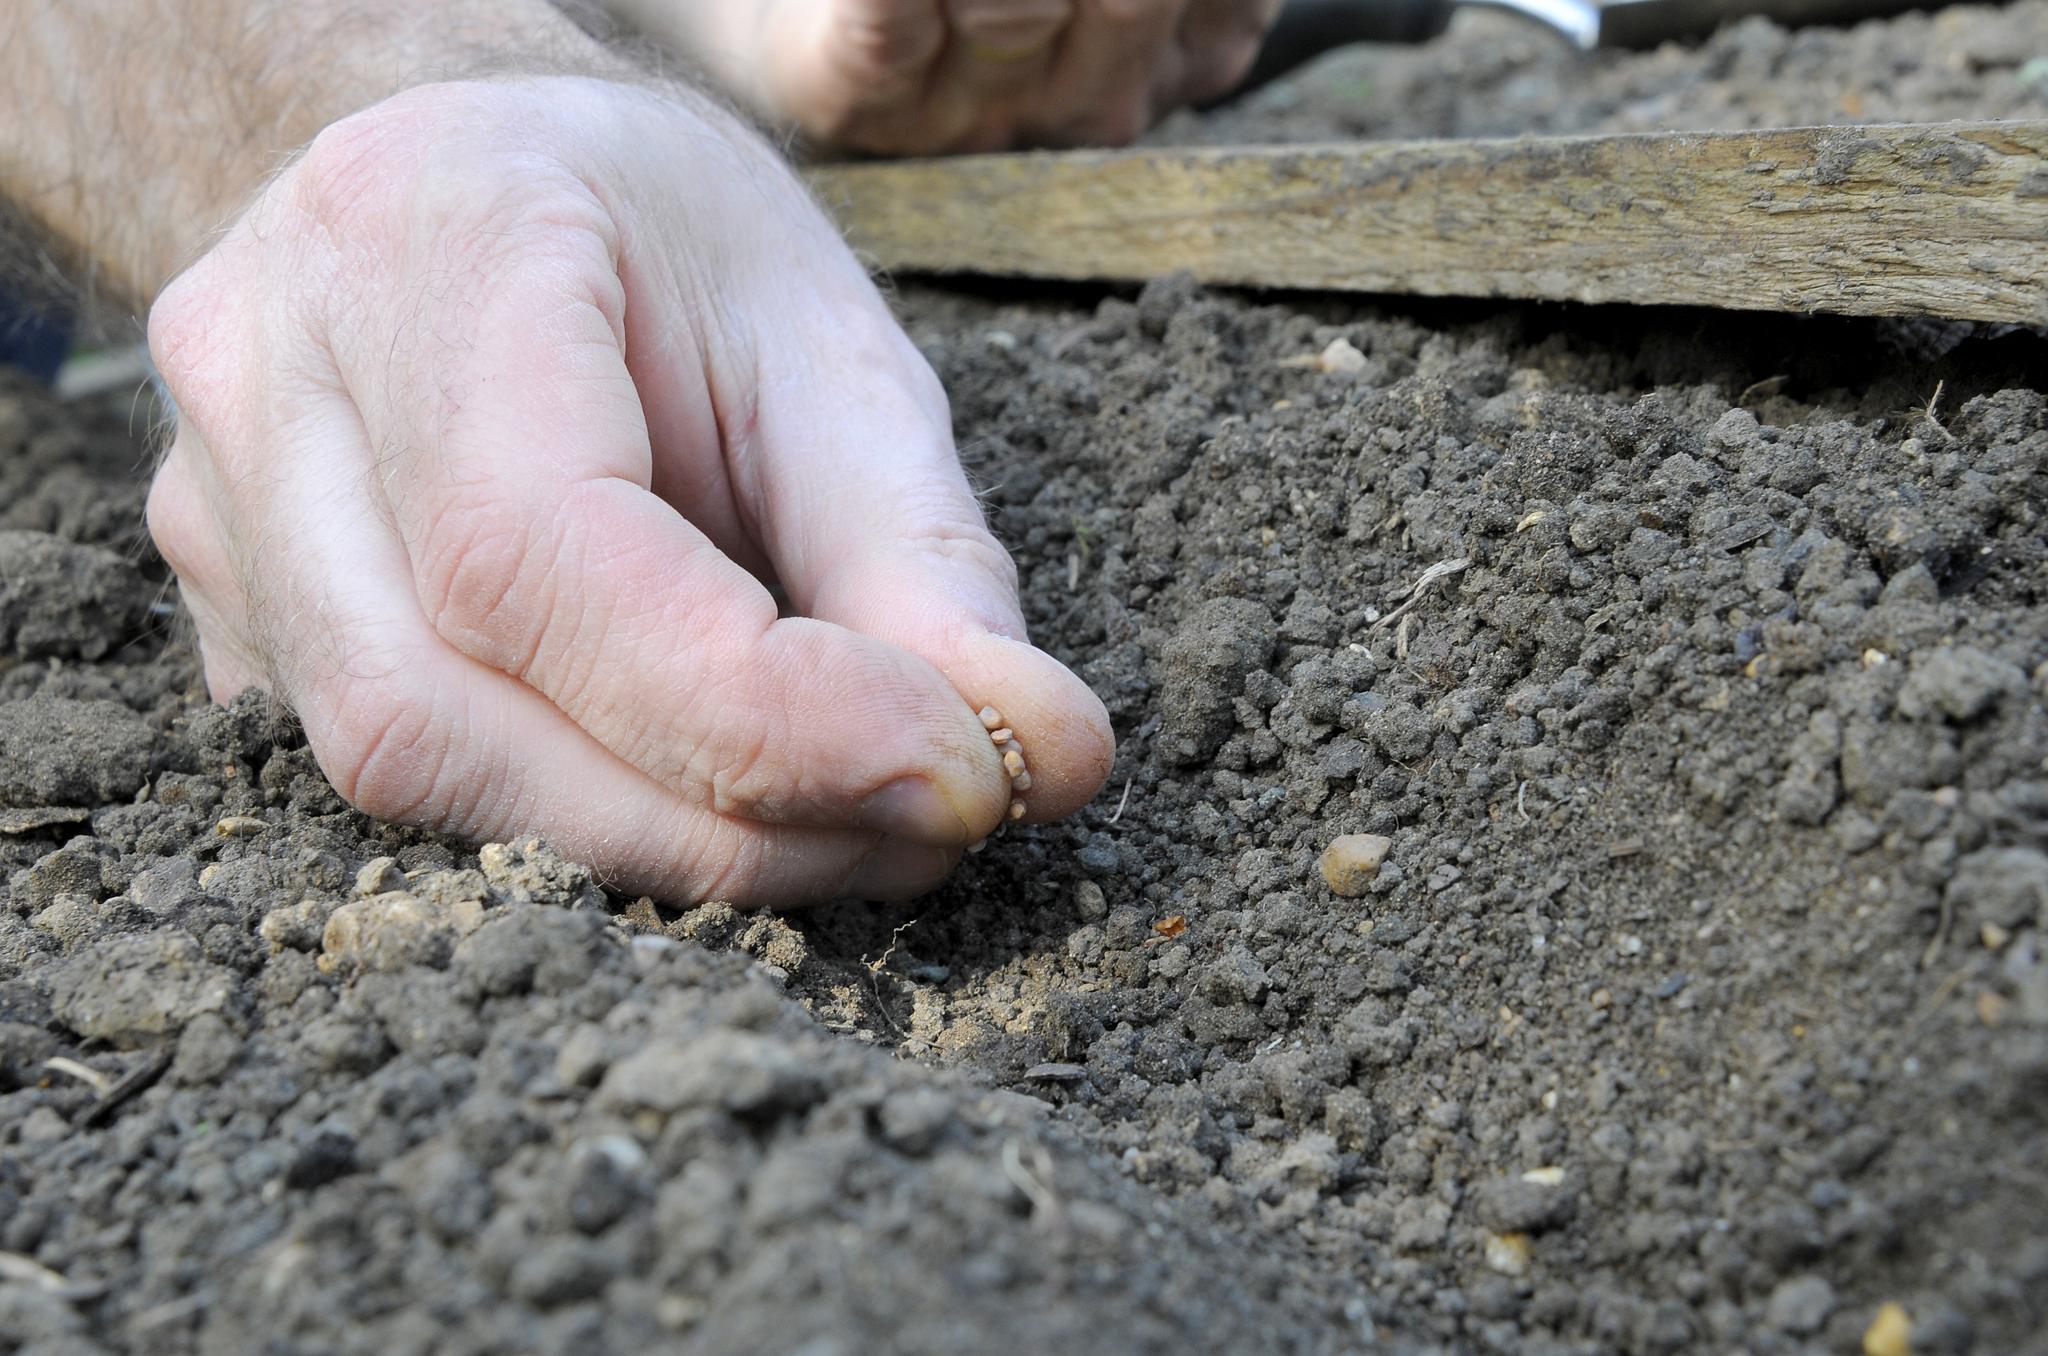 sowing-radish-seed-2